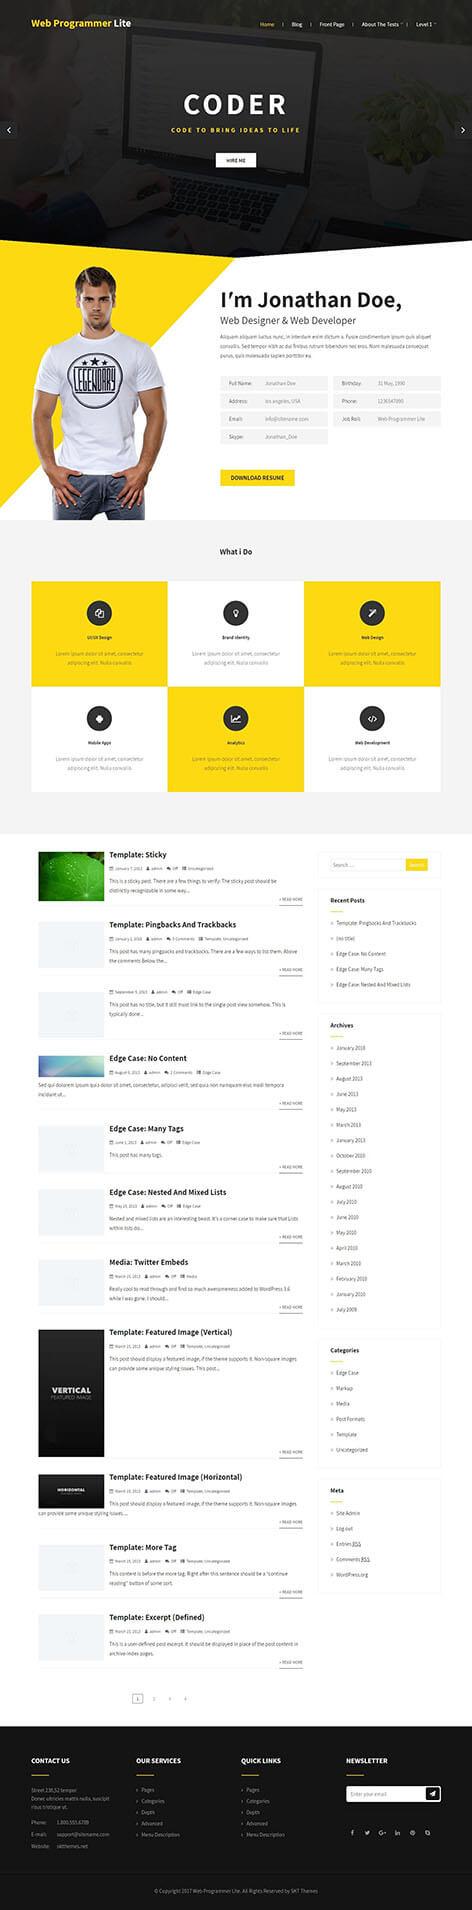 free WordPress theme for designers